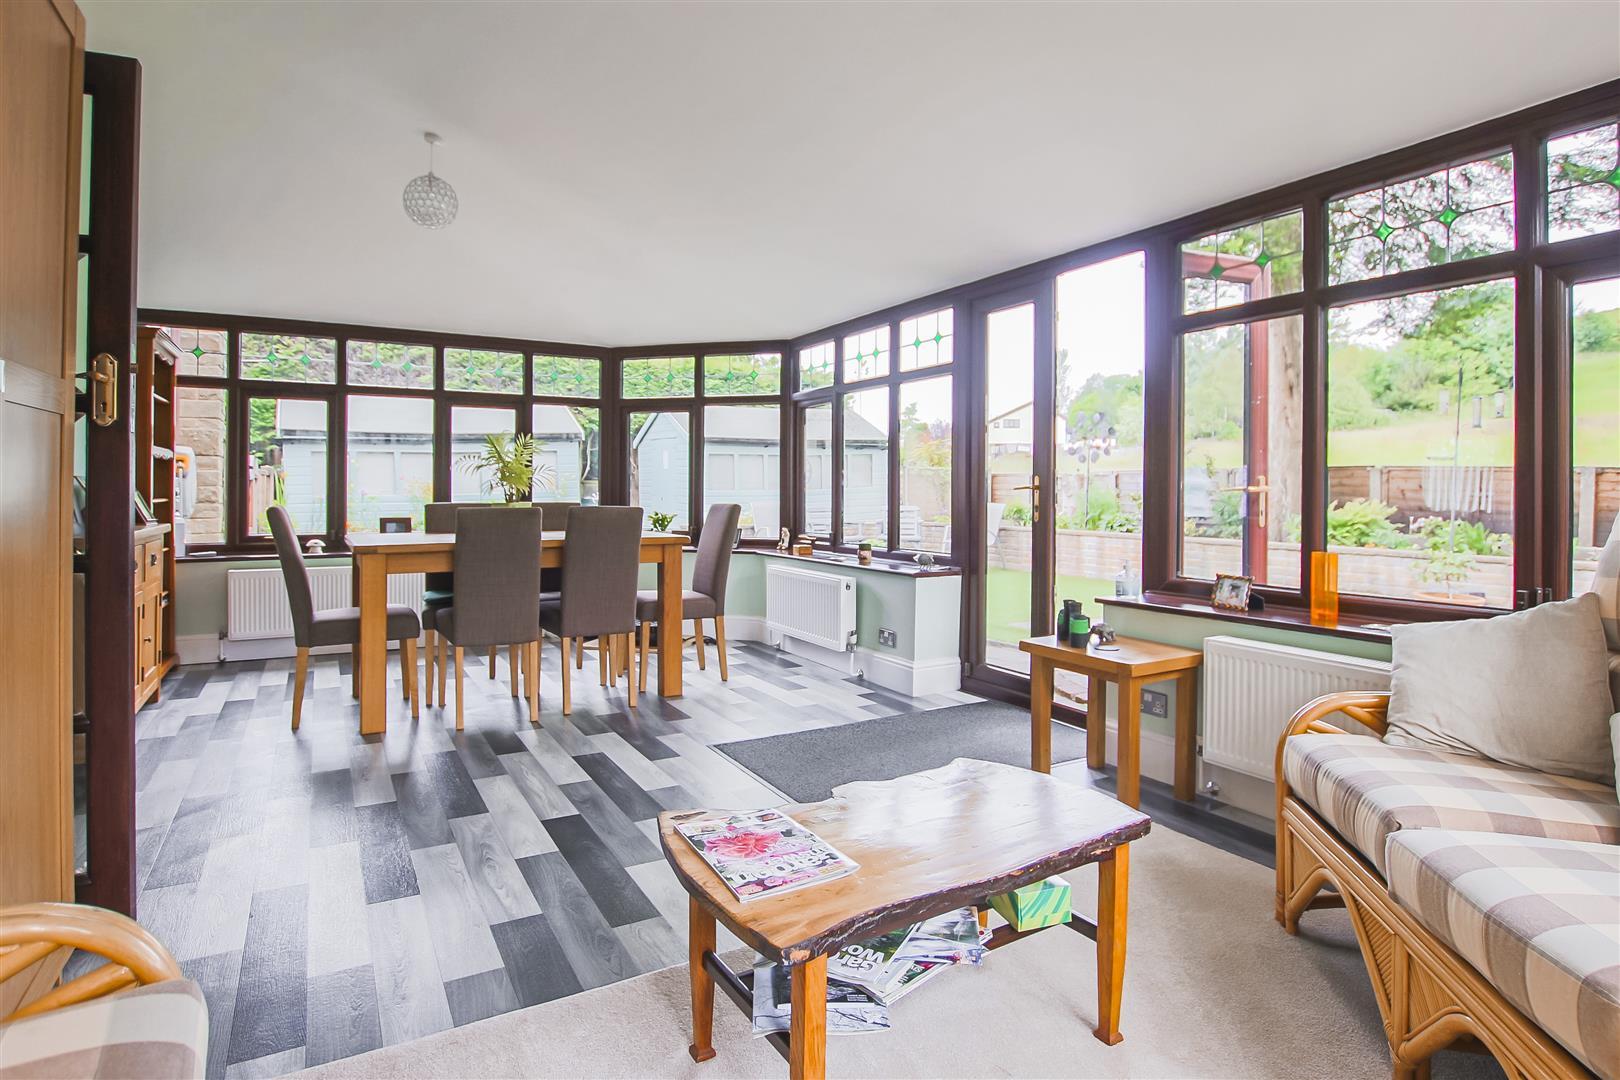 6 Bedroom Detached House For Sale - Annex Dining Room